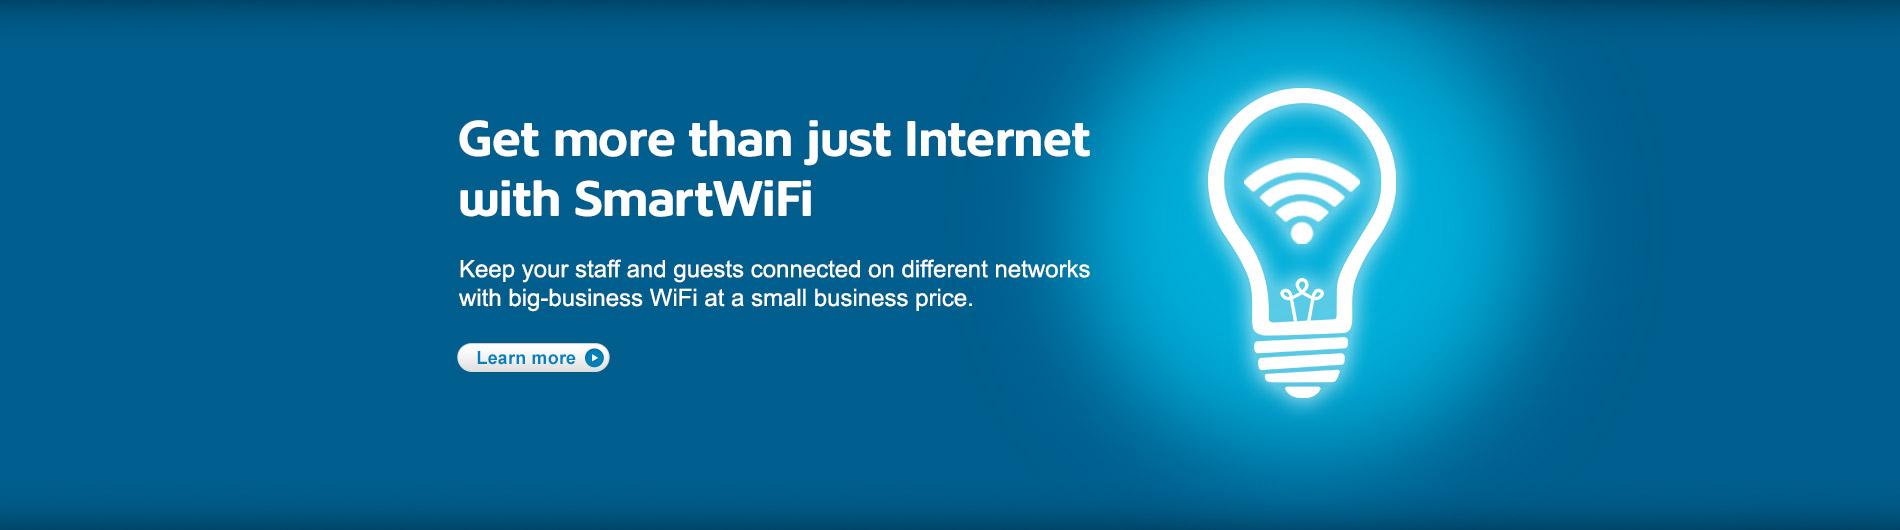 Internet business shaw internet business shaw internet business photos fandeluxe Choice Image